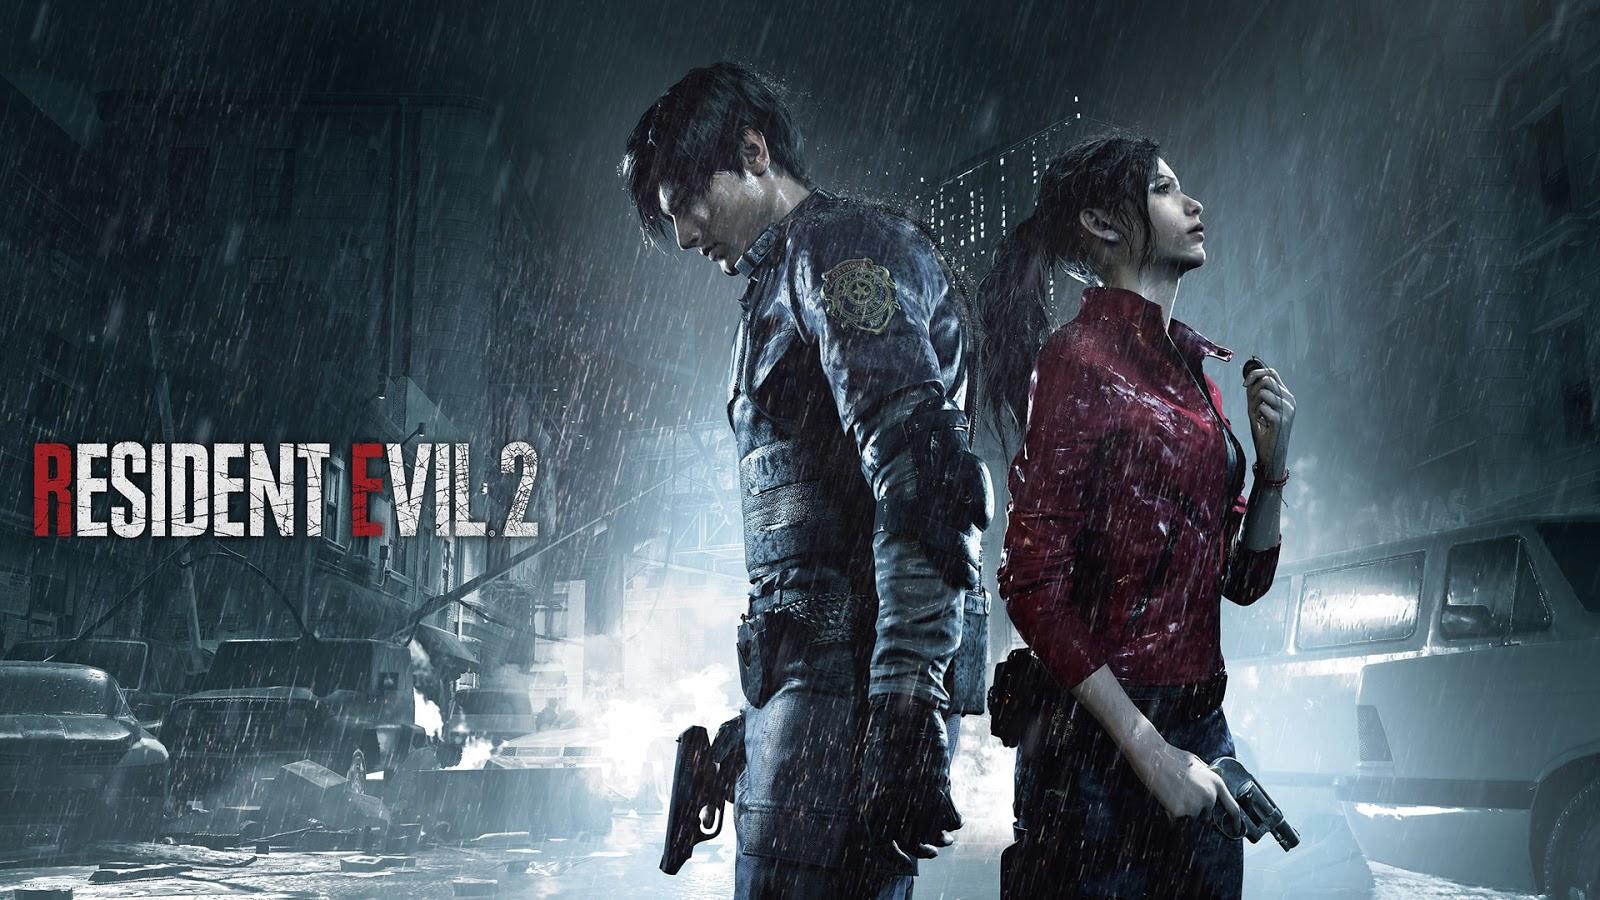 Resident Evil 2 : Remake Versi Android Apk + Obb Terbaru